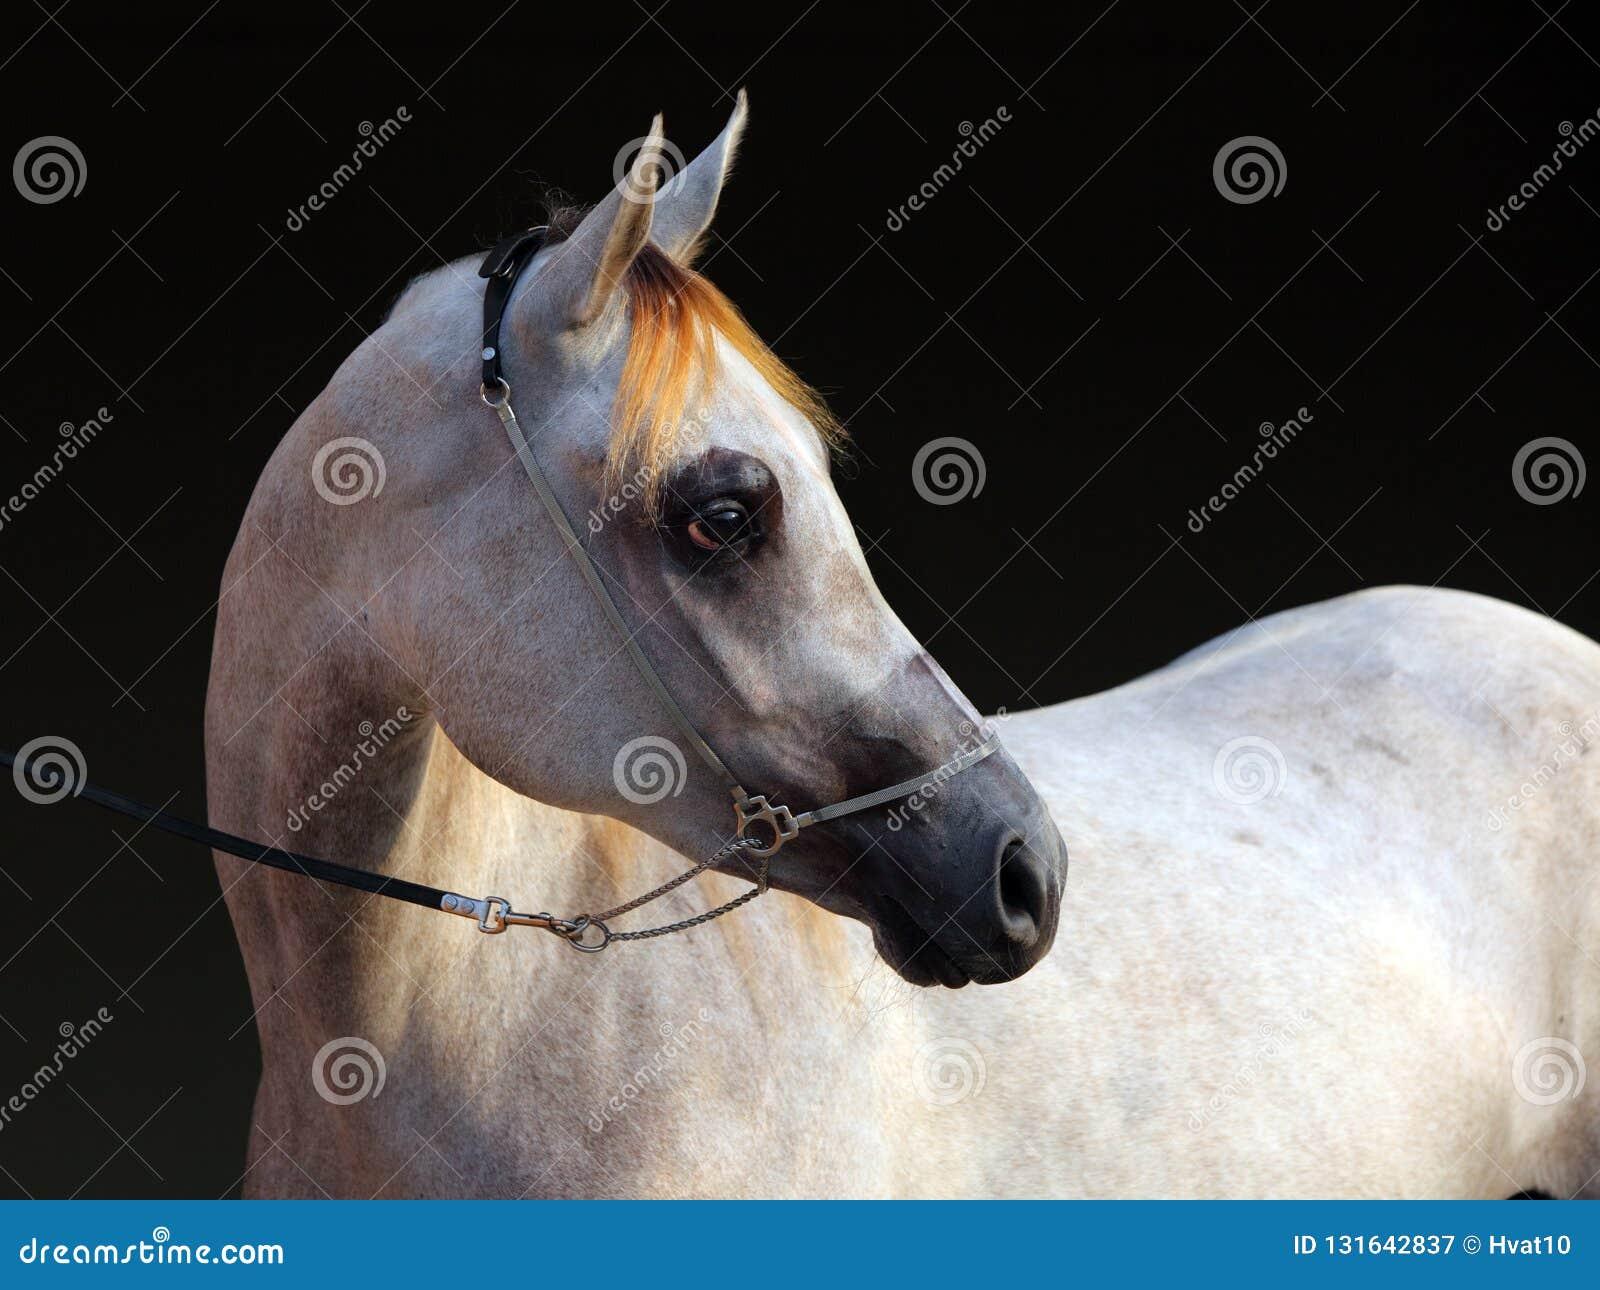 Purebred Arabian Horse Portrait Of A Dapple Gray Mare Stock Image Image Of Bridle Mare 131642837